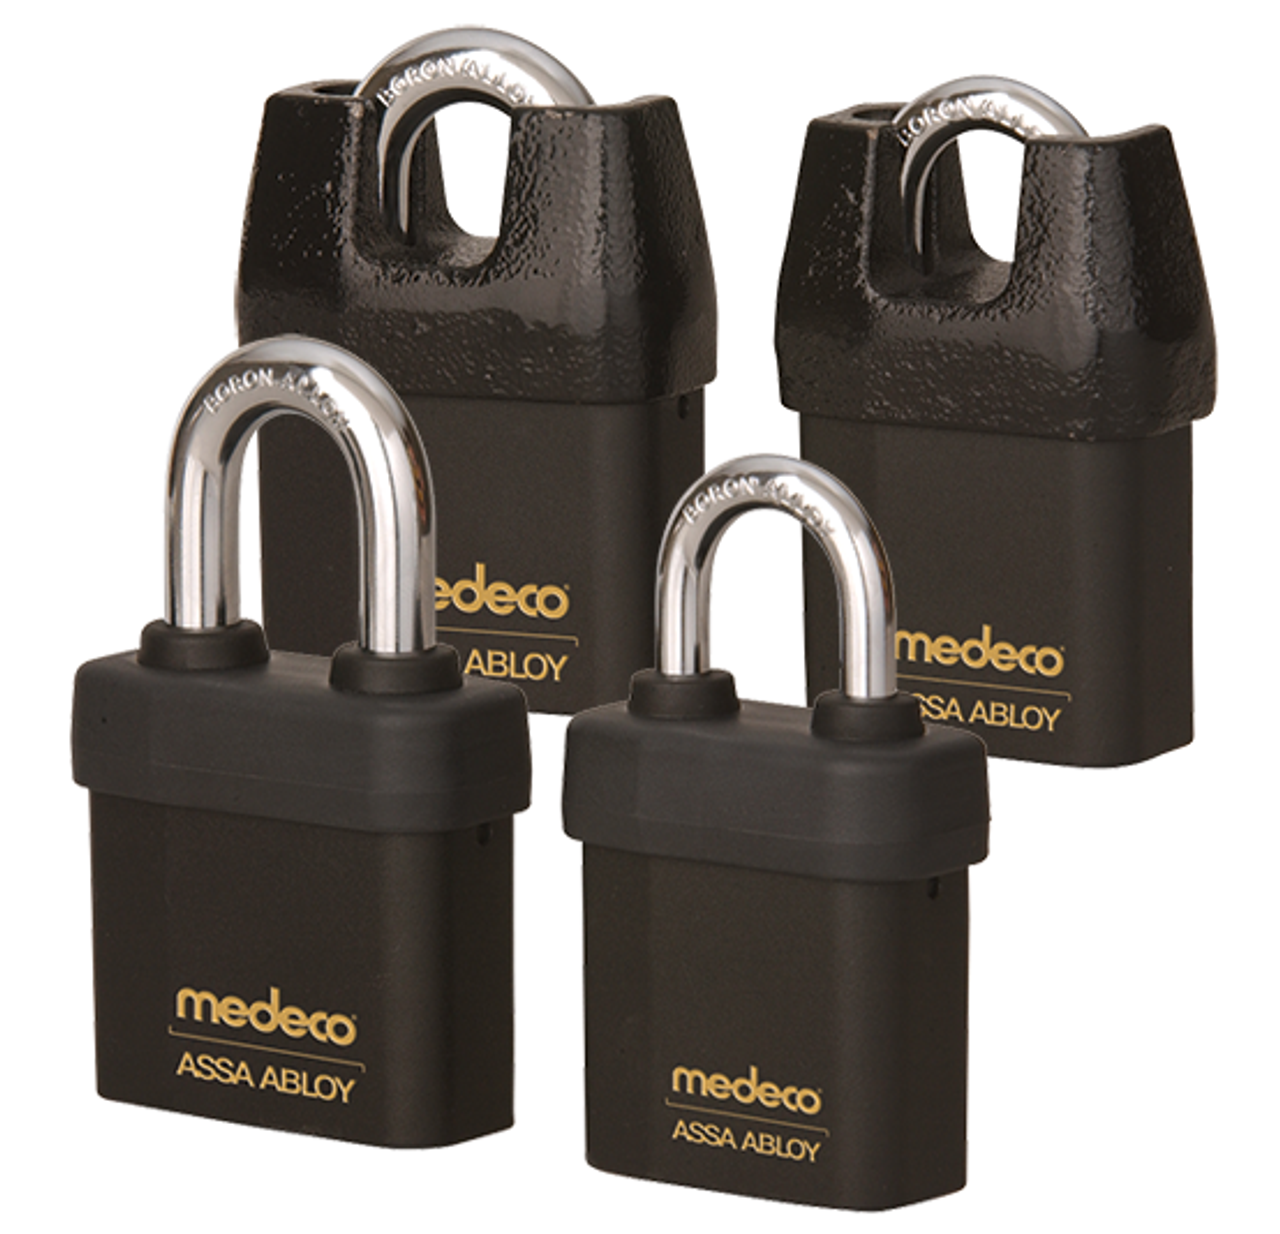 Medeco 54 Series All-Weather Padlocks